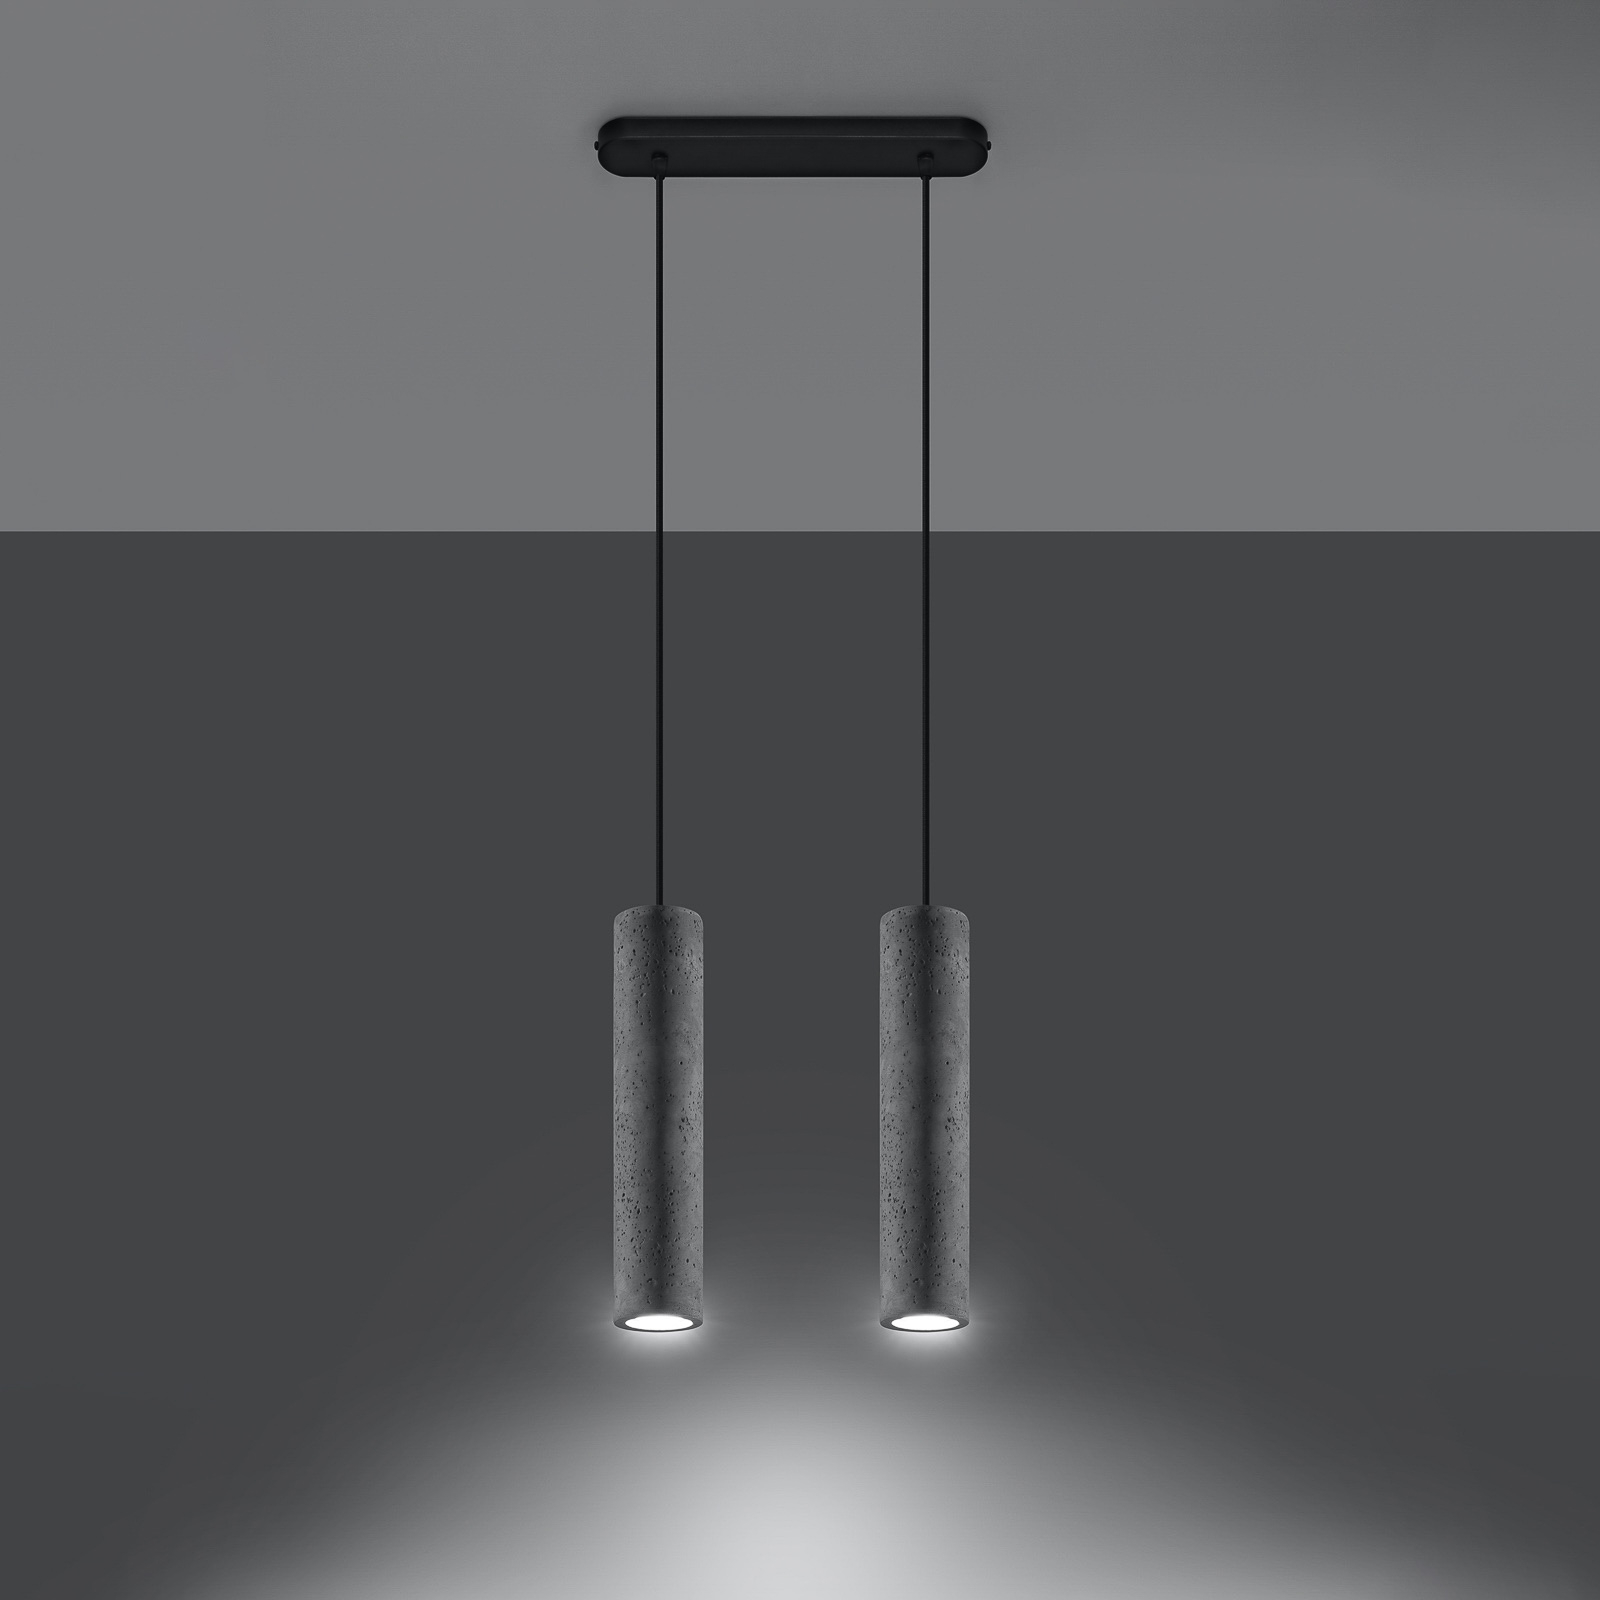 Lampa wisząca Tube z betonu, 2-punktowa